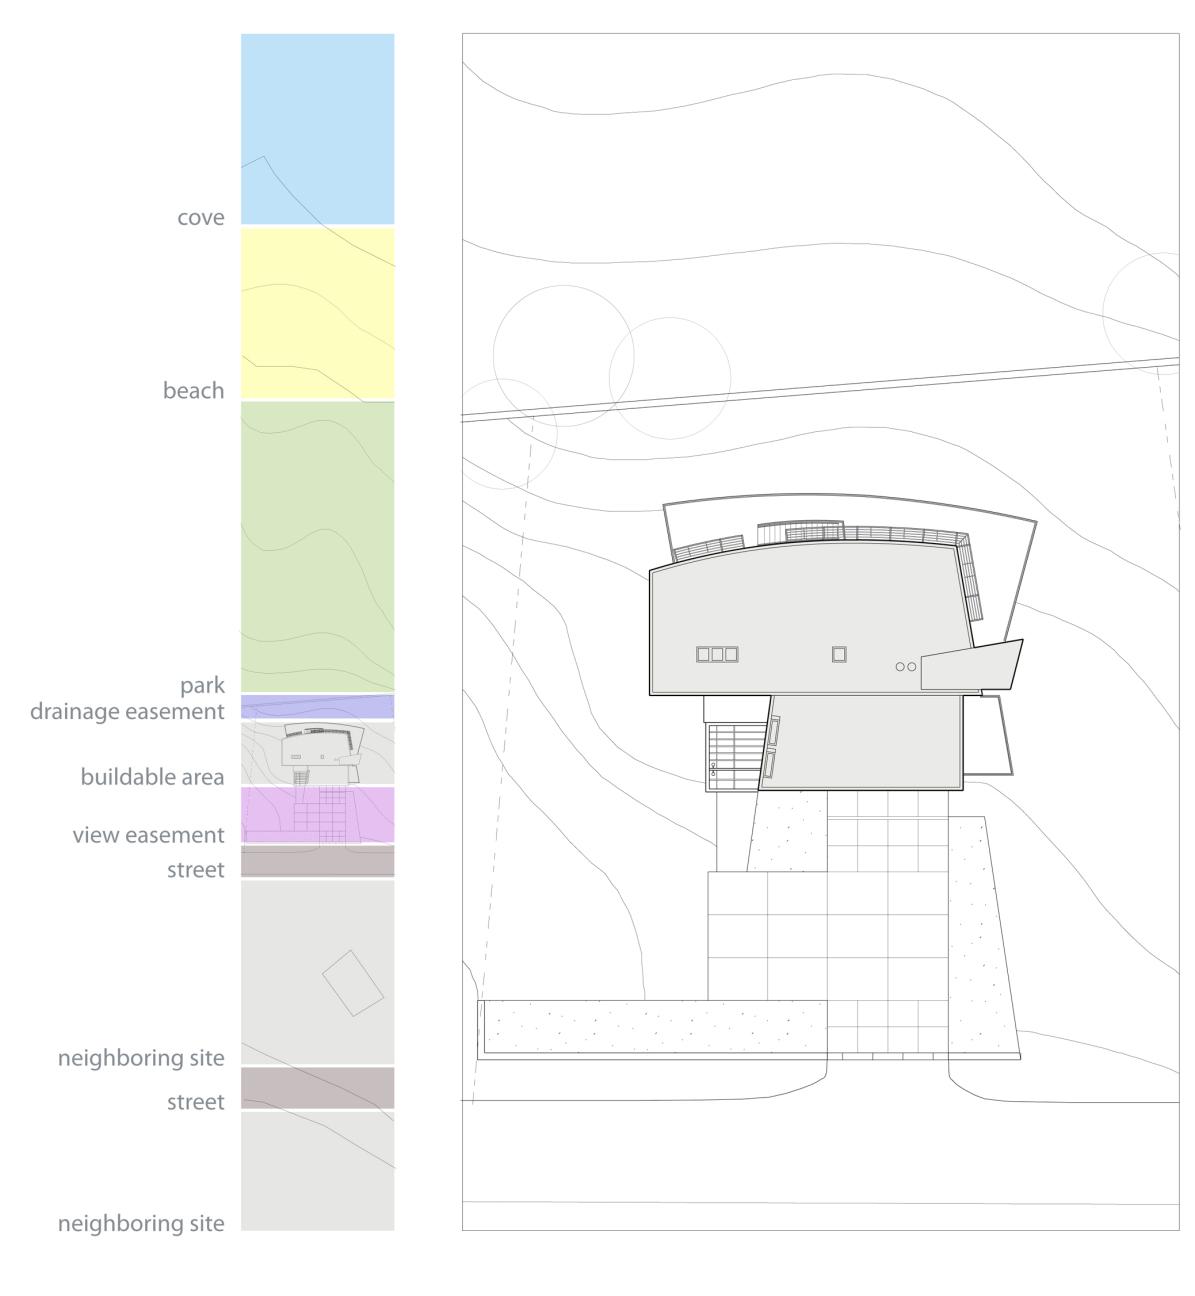 Franco_Siteplan diagram 2011